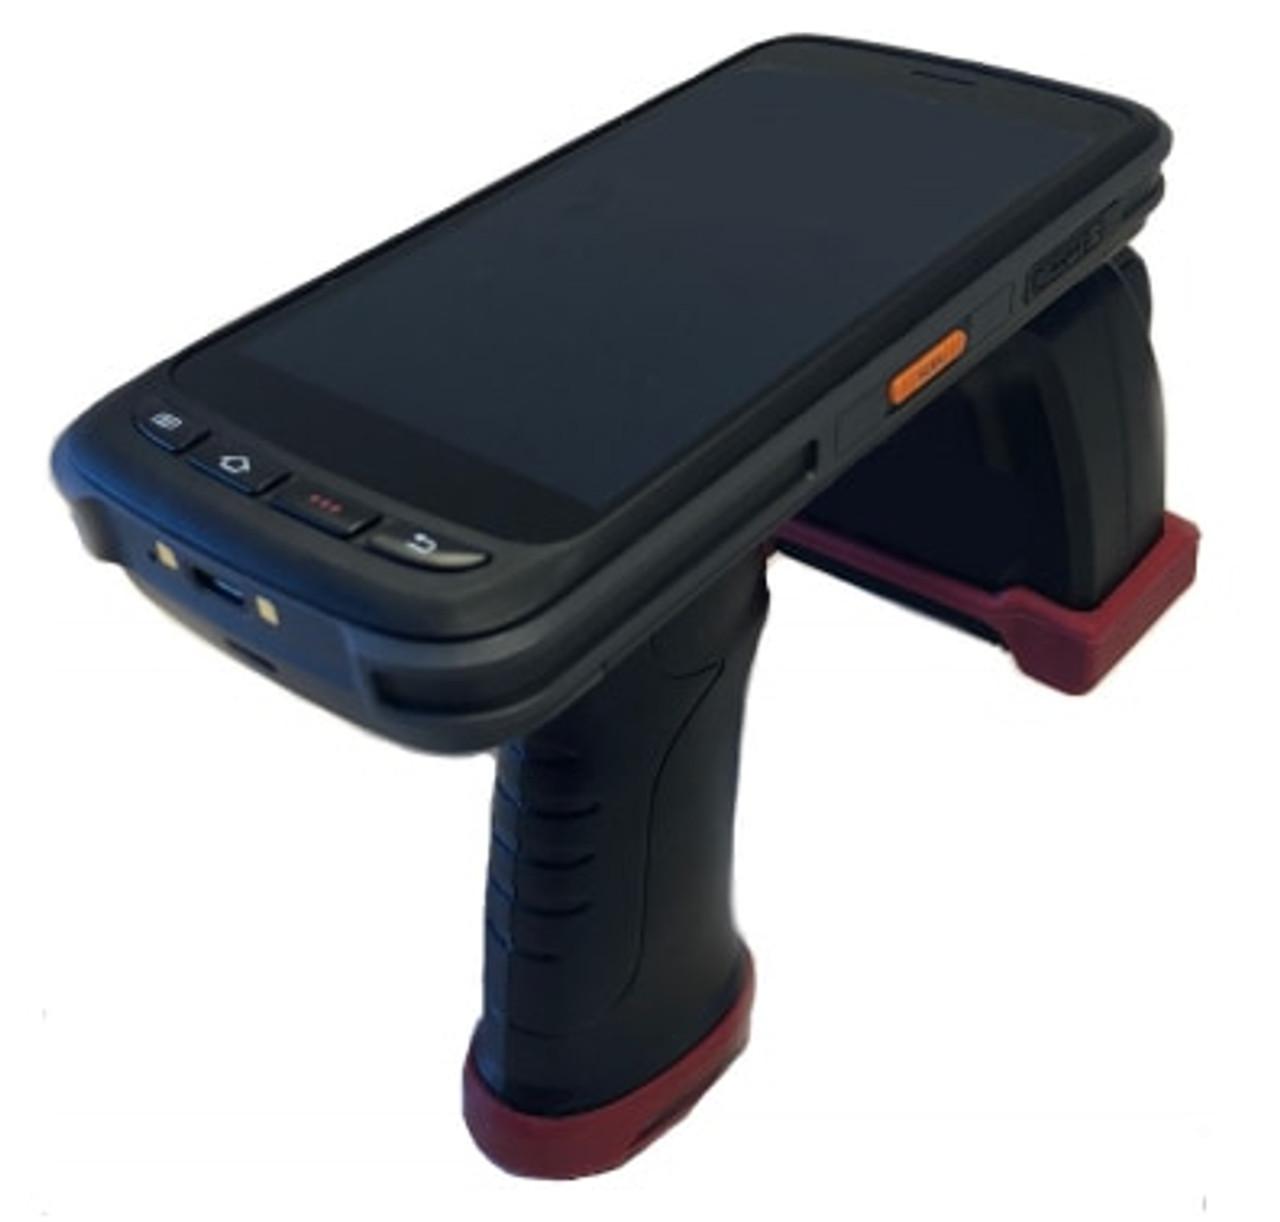 Alien ALR-H460 Handheld UHF RFID Reader